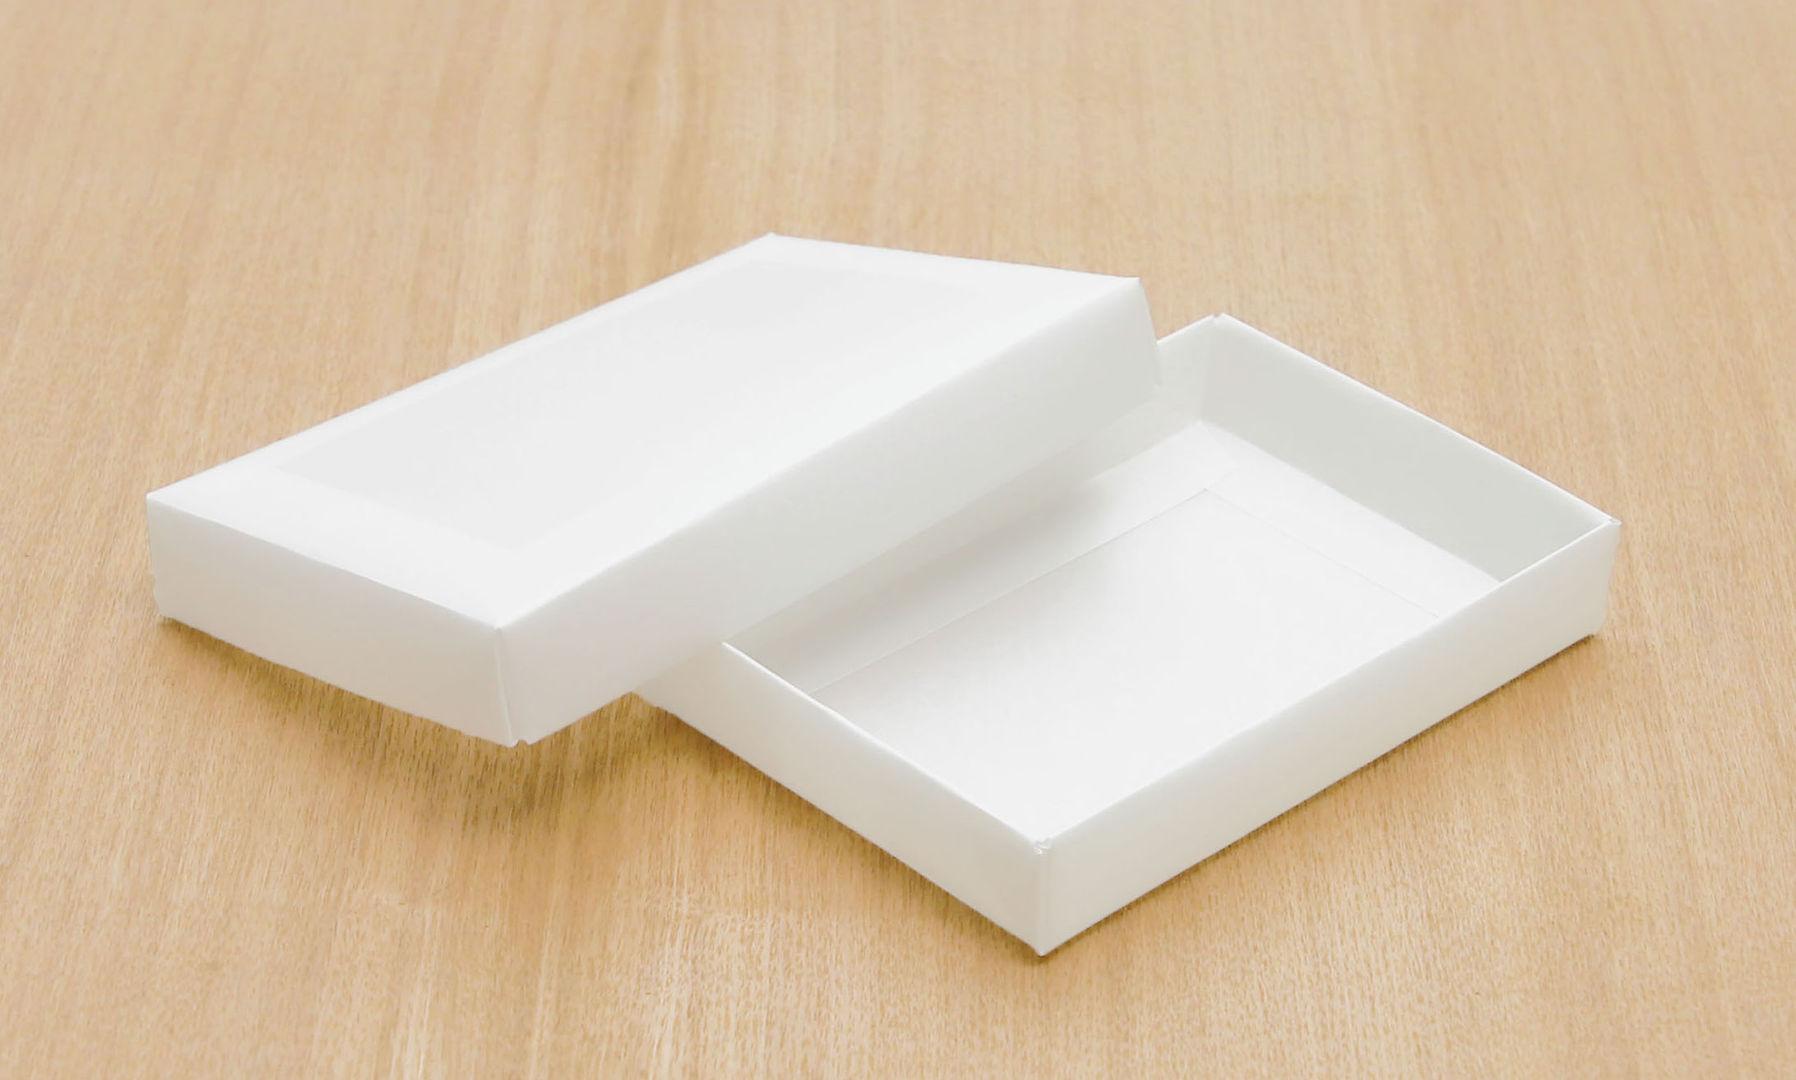 06-Box_02.jpg